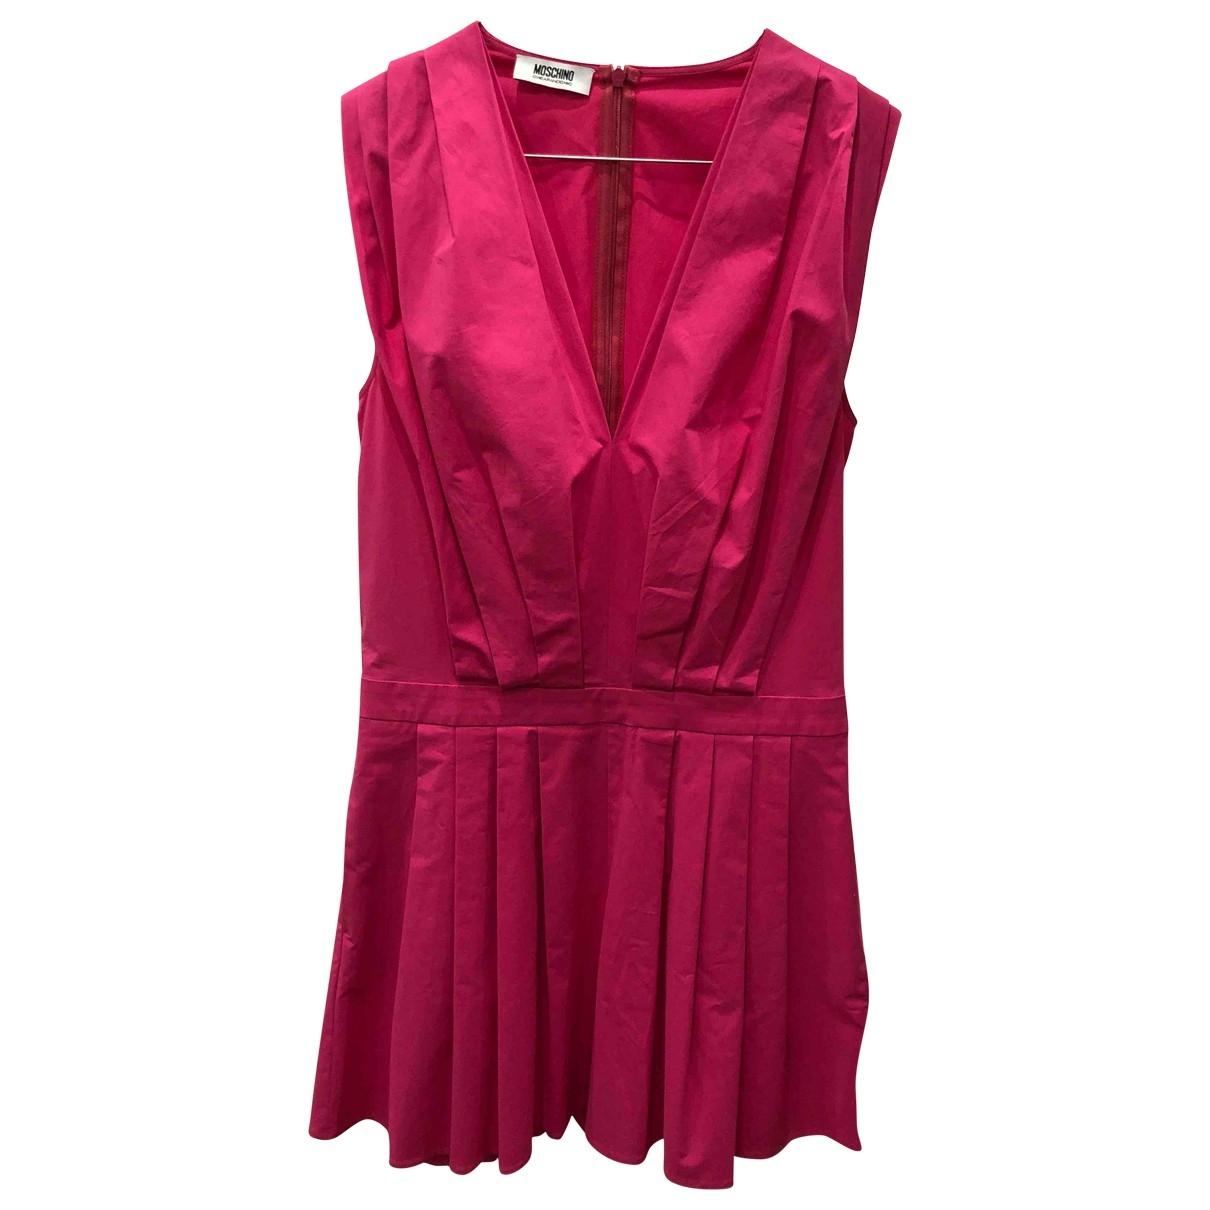 Moschino Cheap And Chic - Combinaison   pour femme en coton - rose